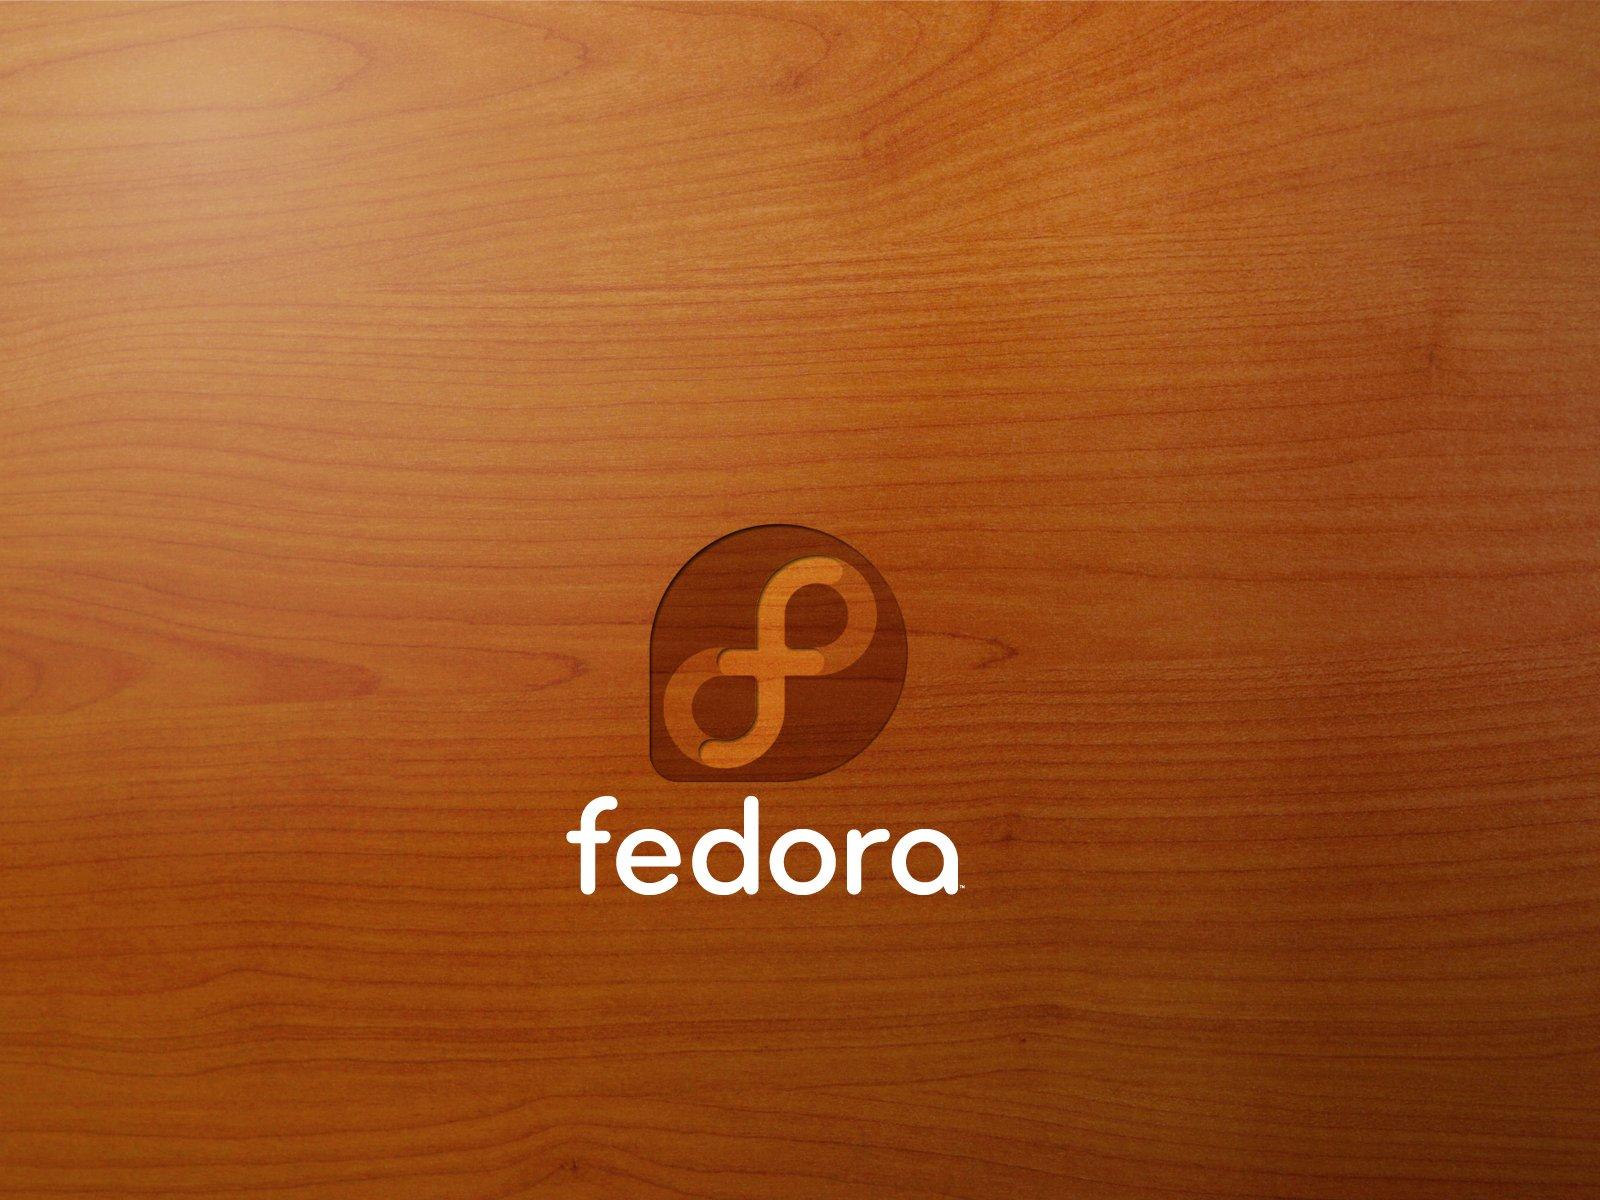 fedora_fedorafans.com